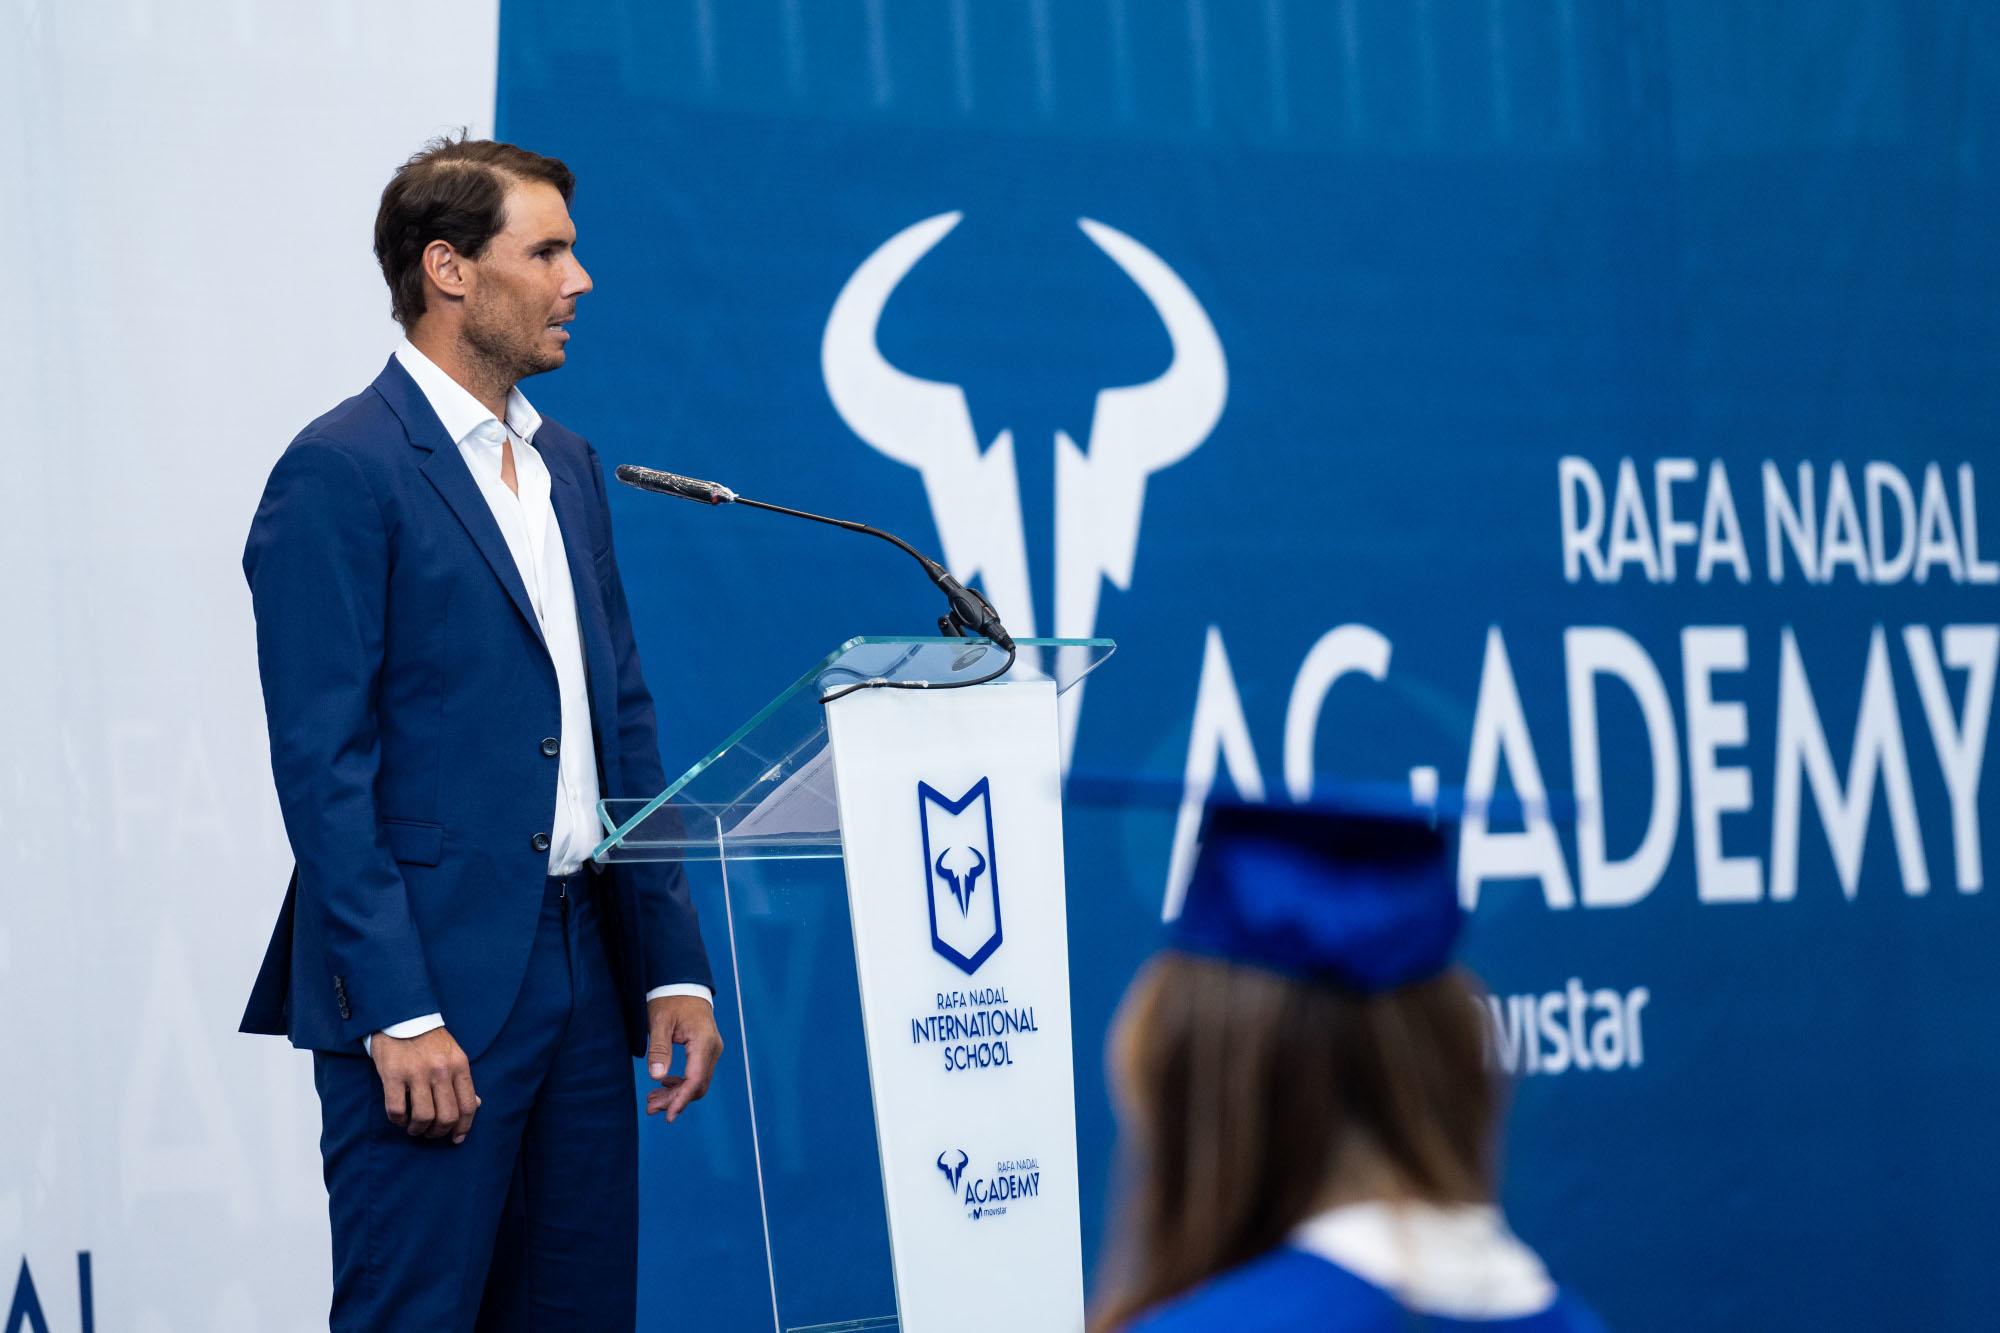 Federer And Sharapova Join Rafa Nadal Via Video Link At The Rafa Nadal International School Graduation